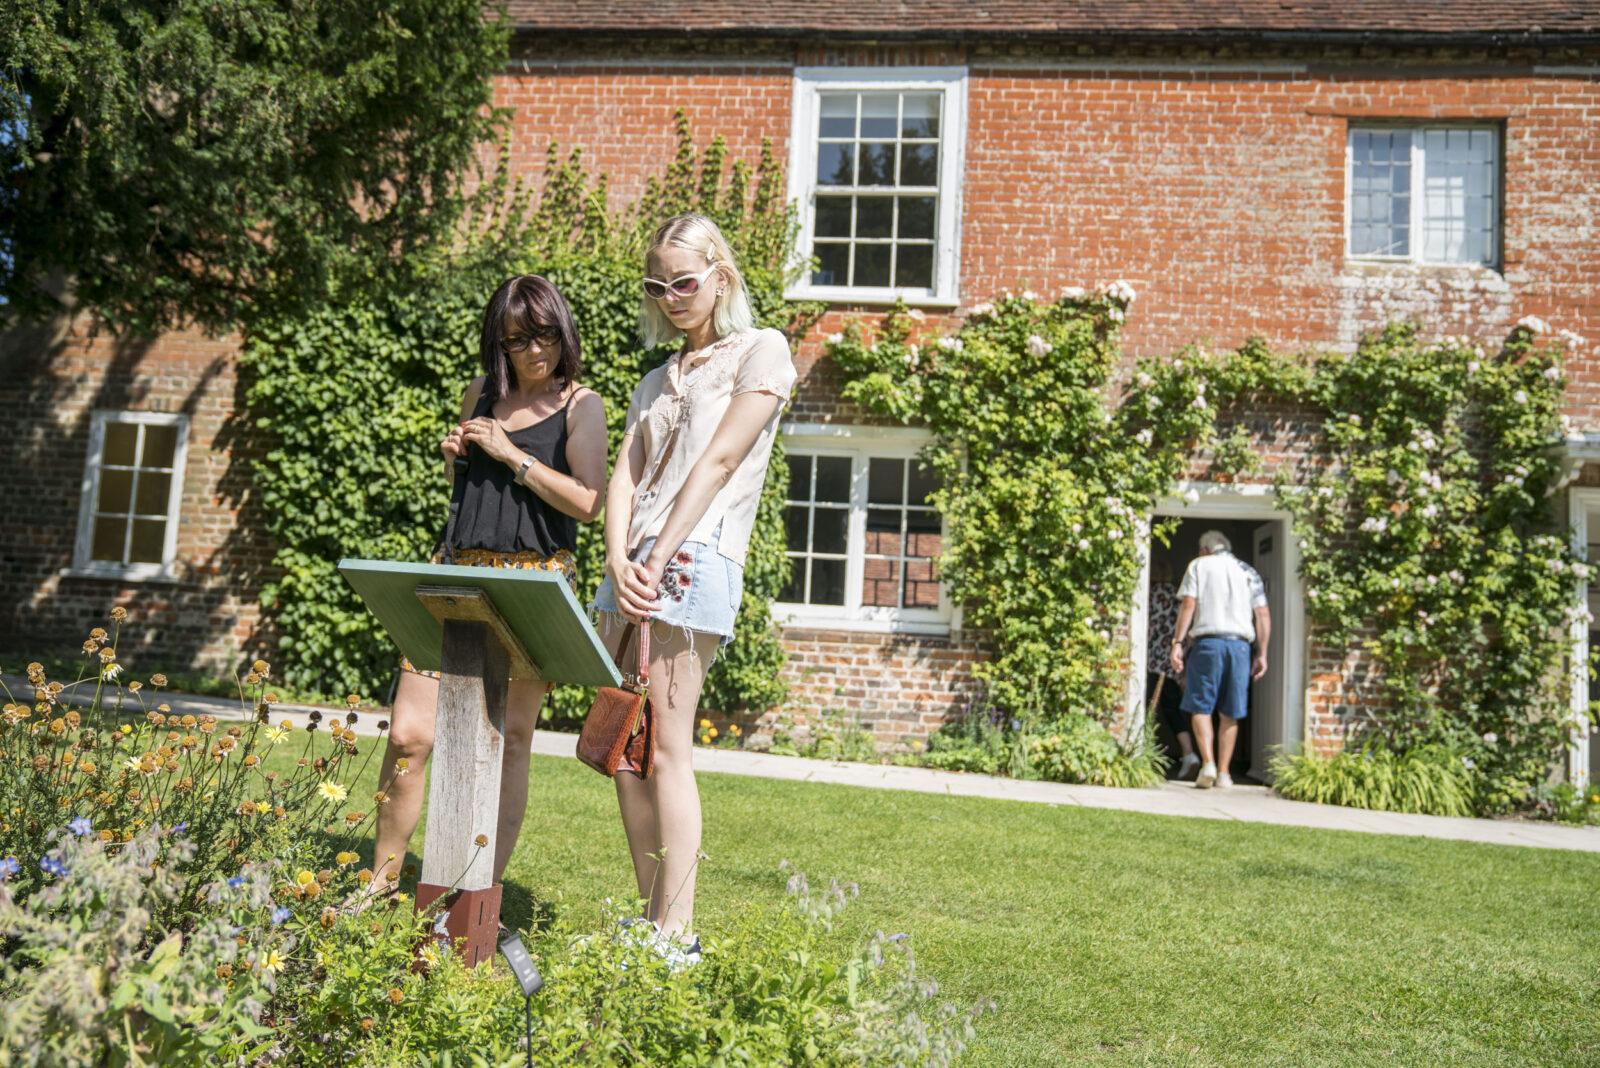 Visitors in the garden at Jane Austen's House